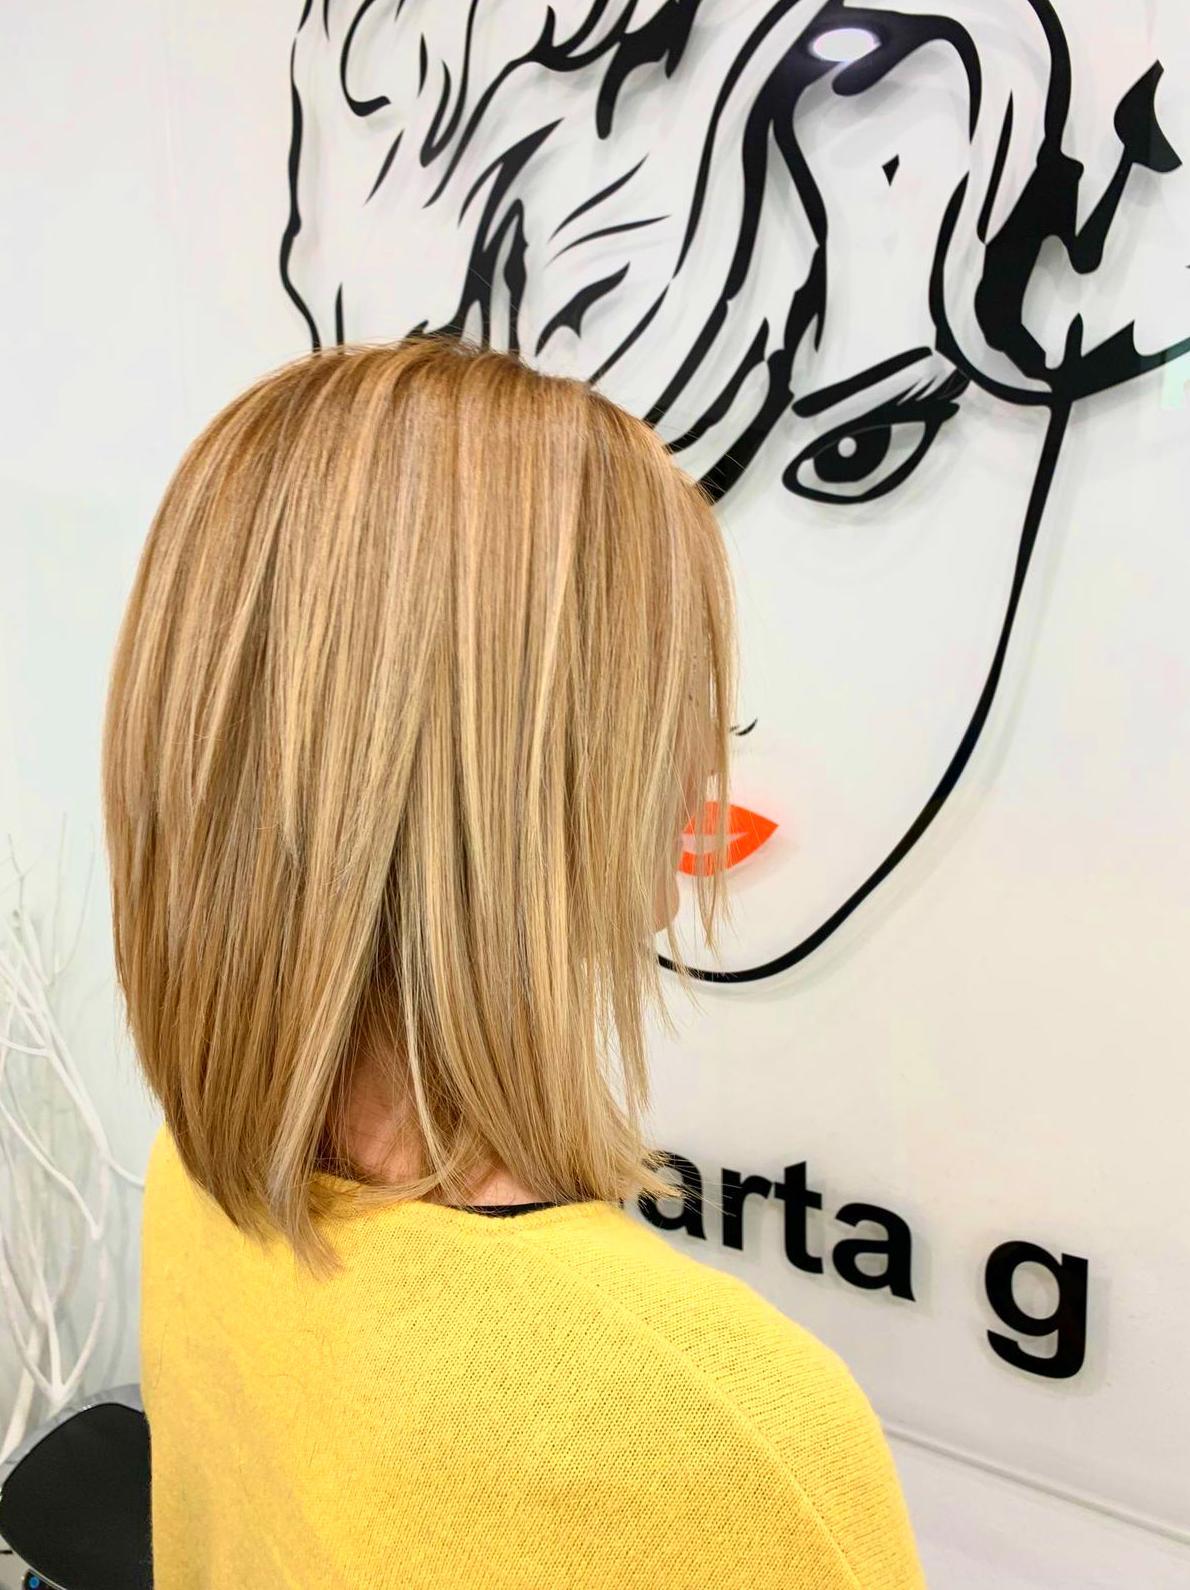 Foto 6 de Centros de estética en  | Marta G. Estilismo